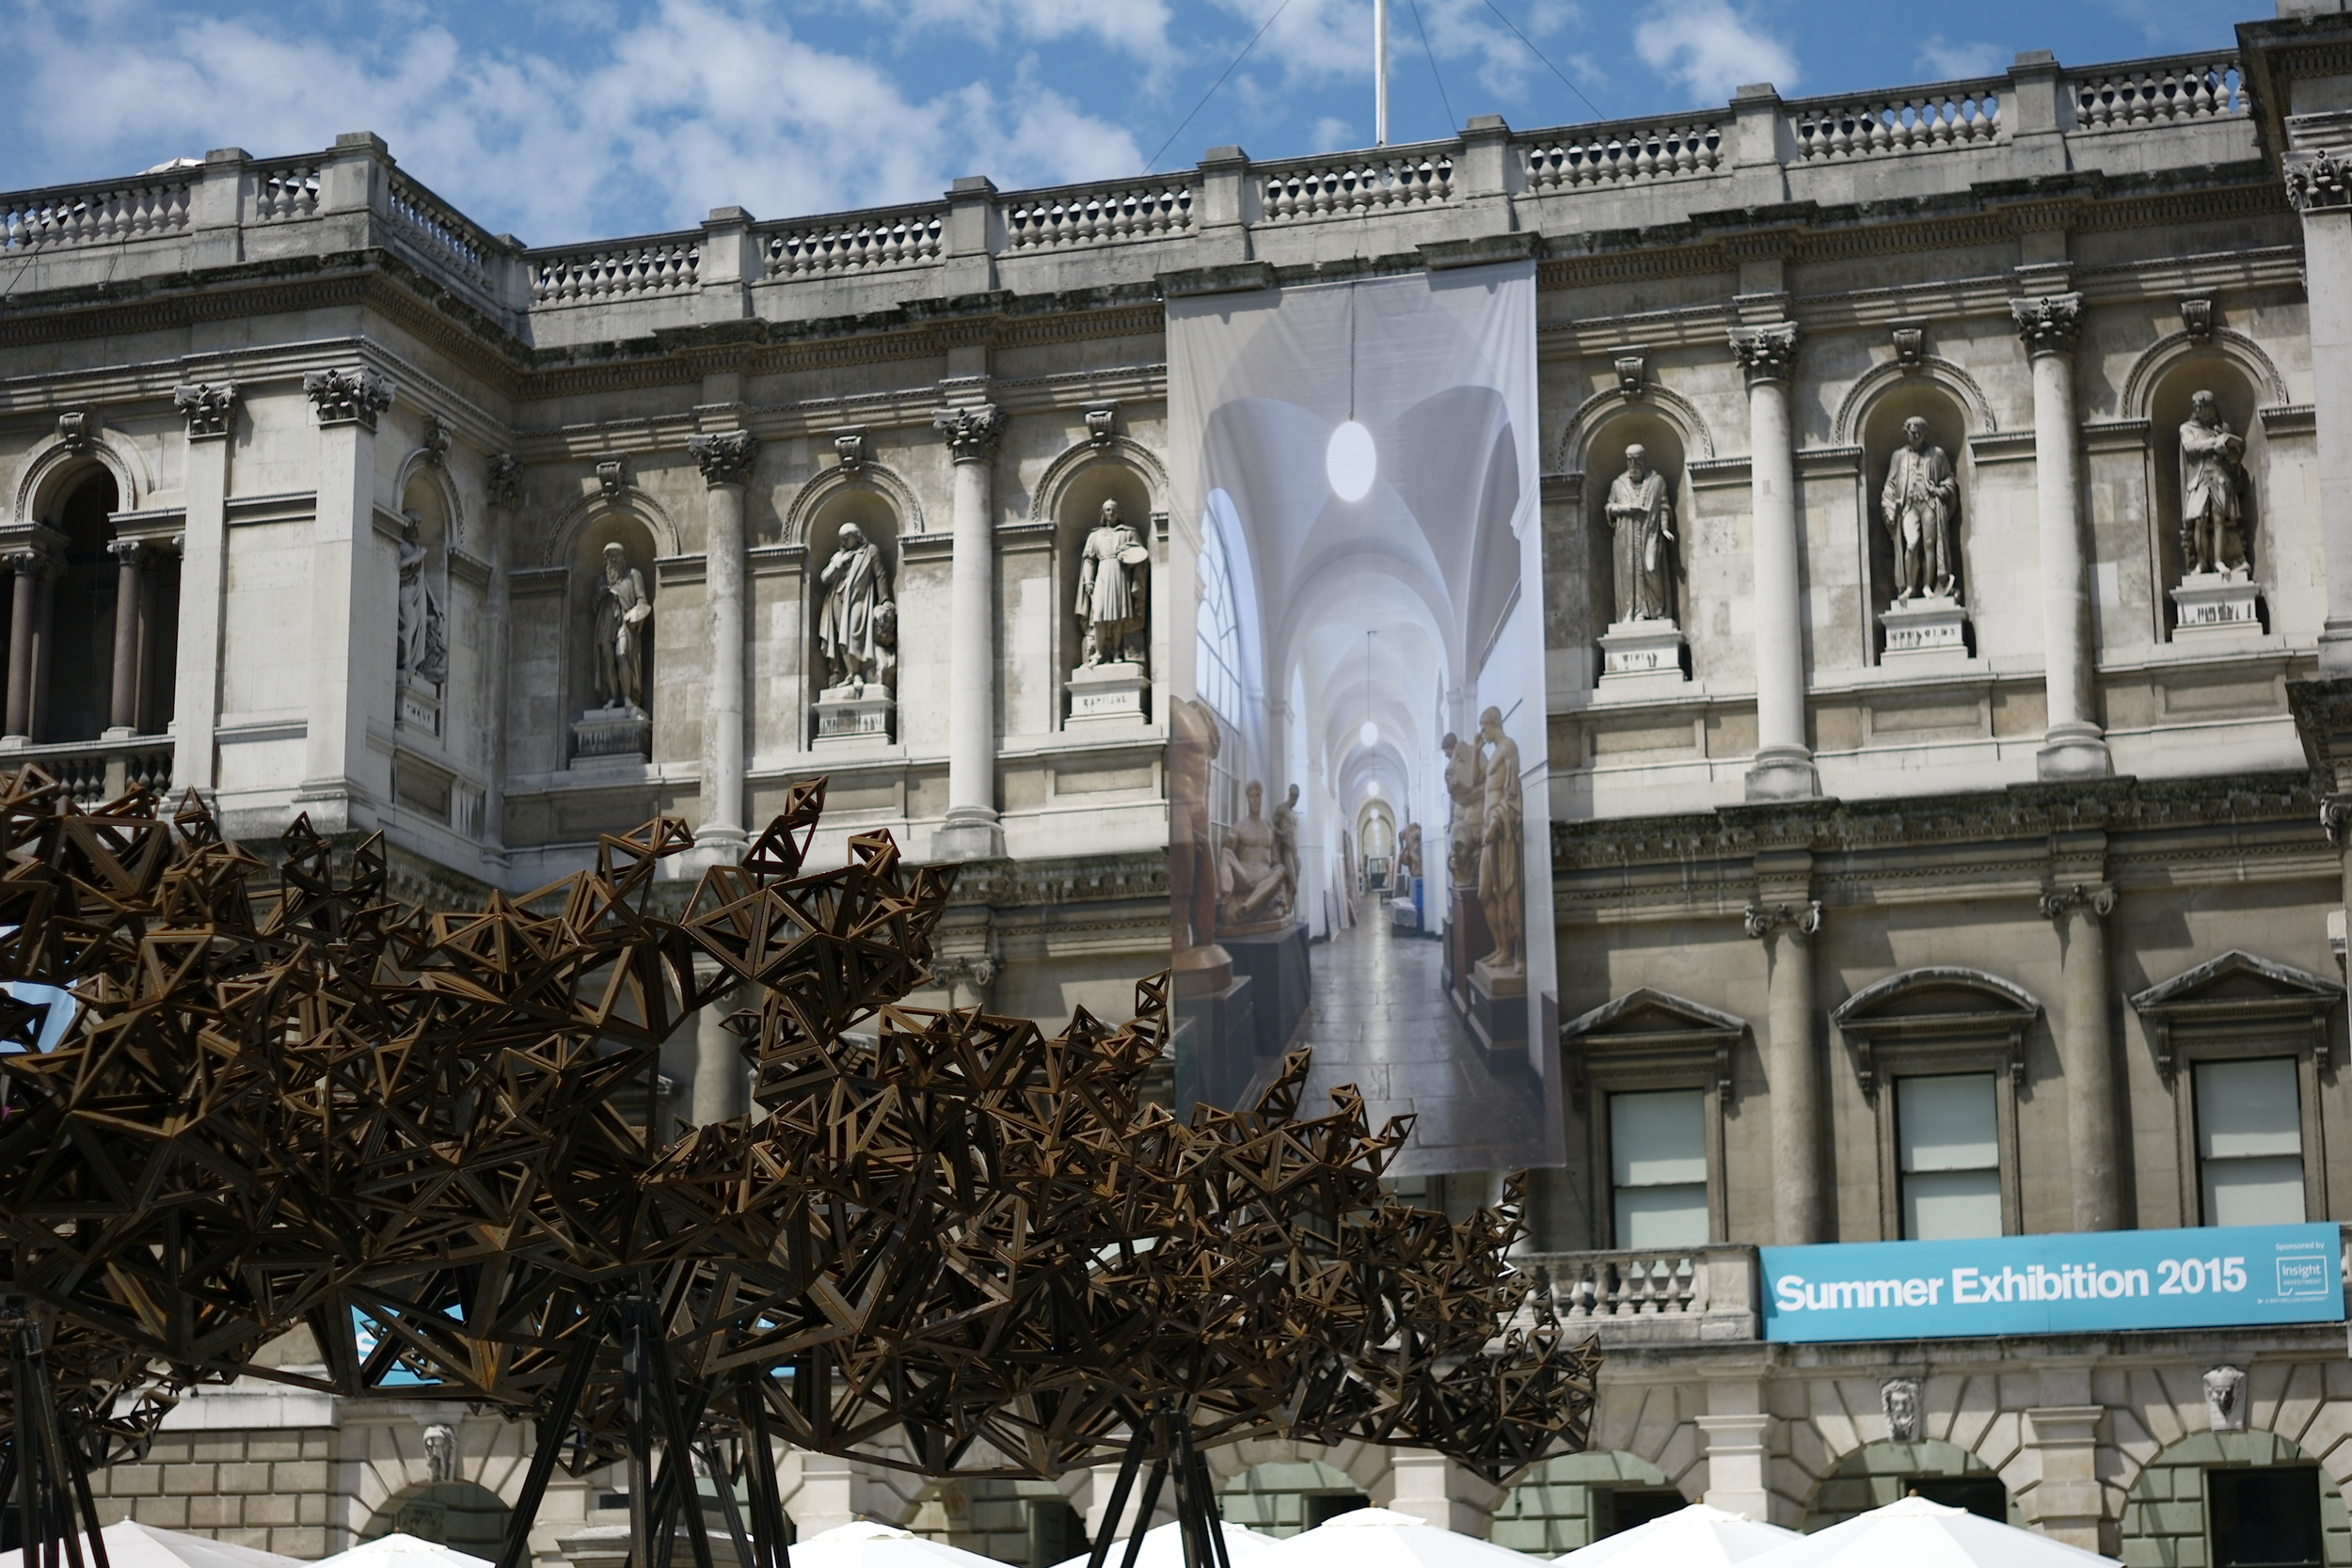 cs Royal Academy of Arts 3.JPG